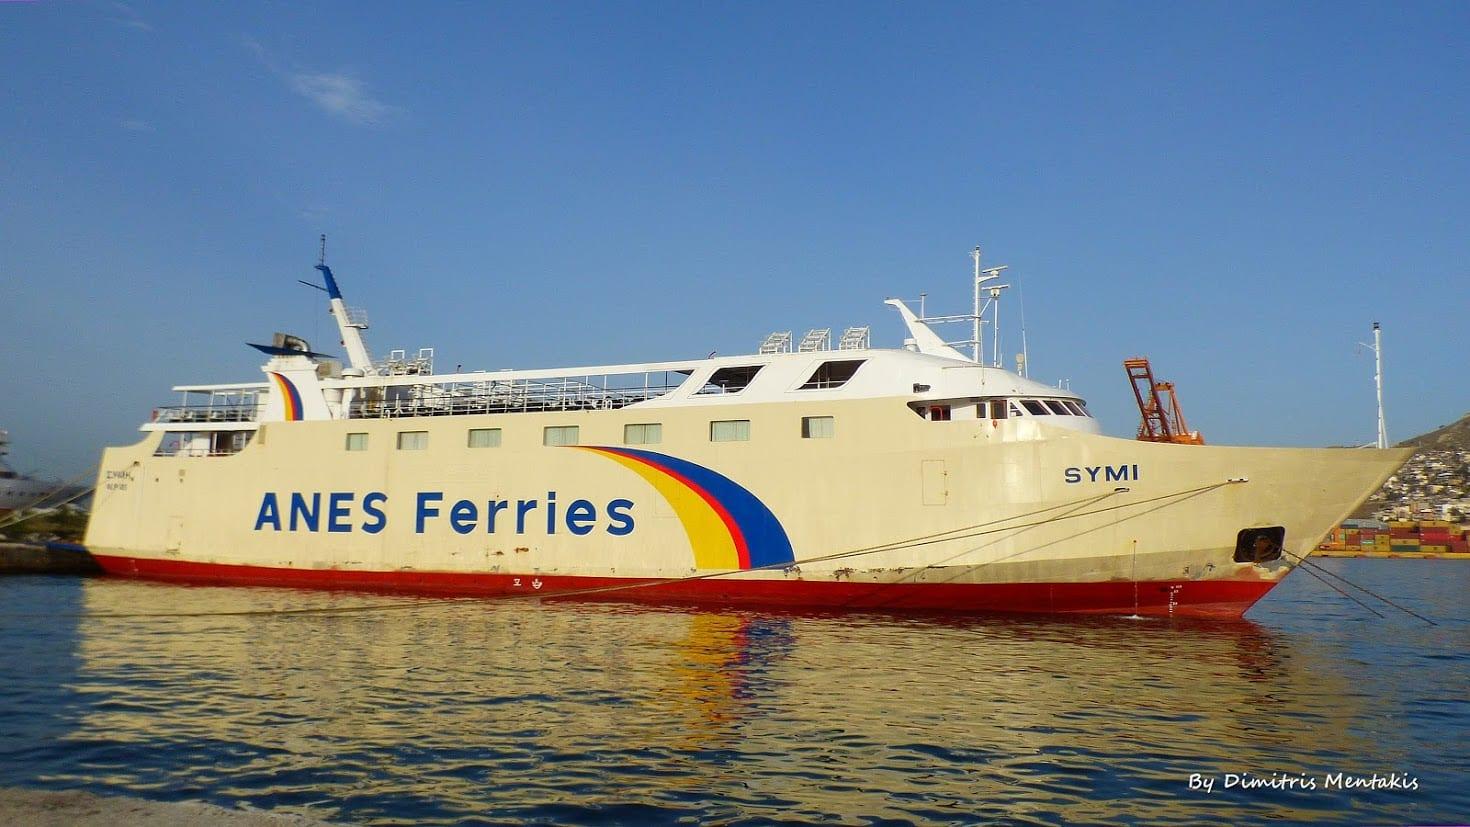 Anes Ferries Symi boat